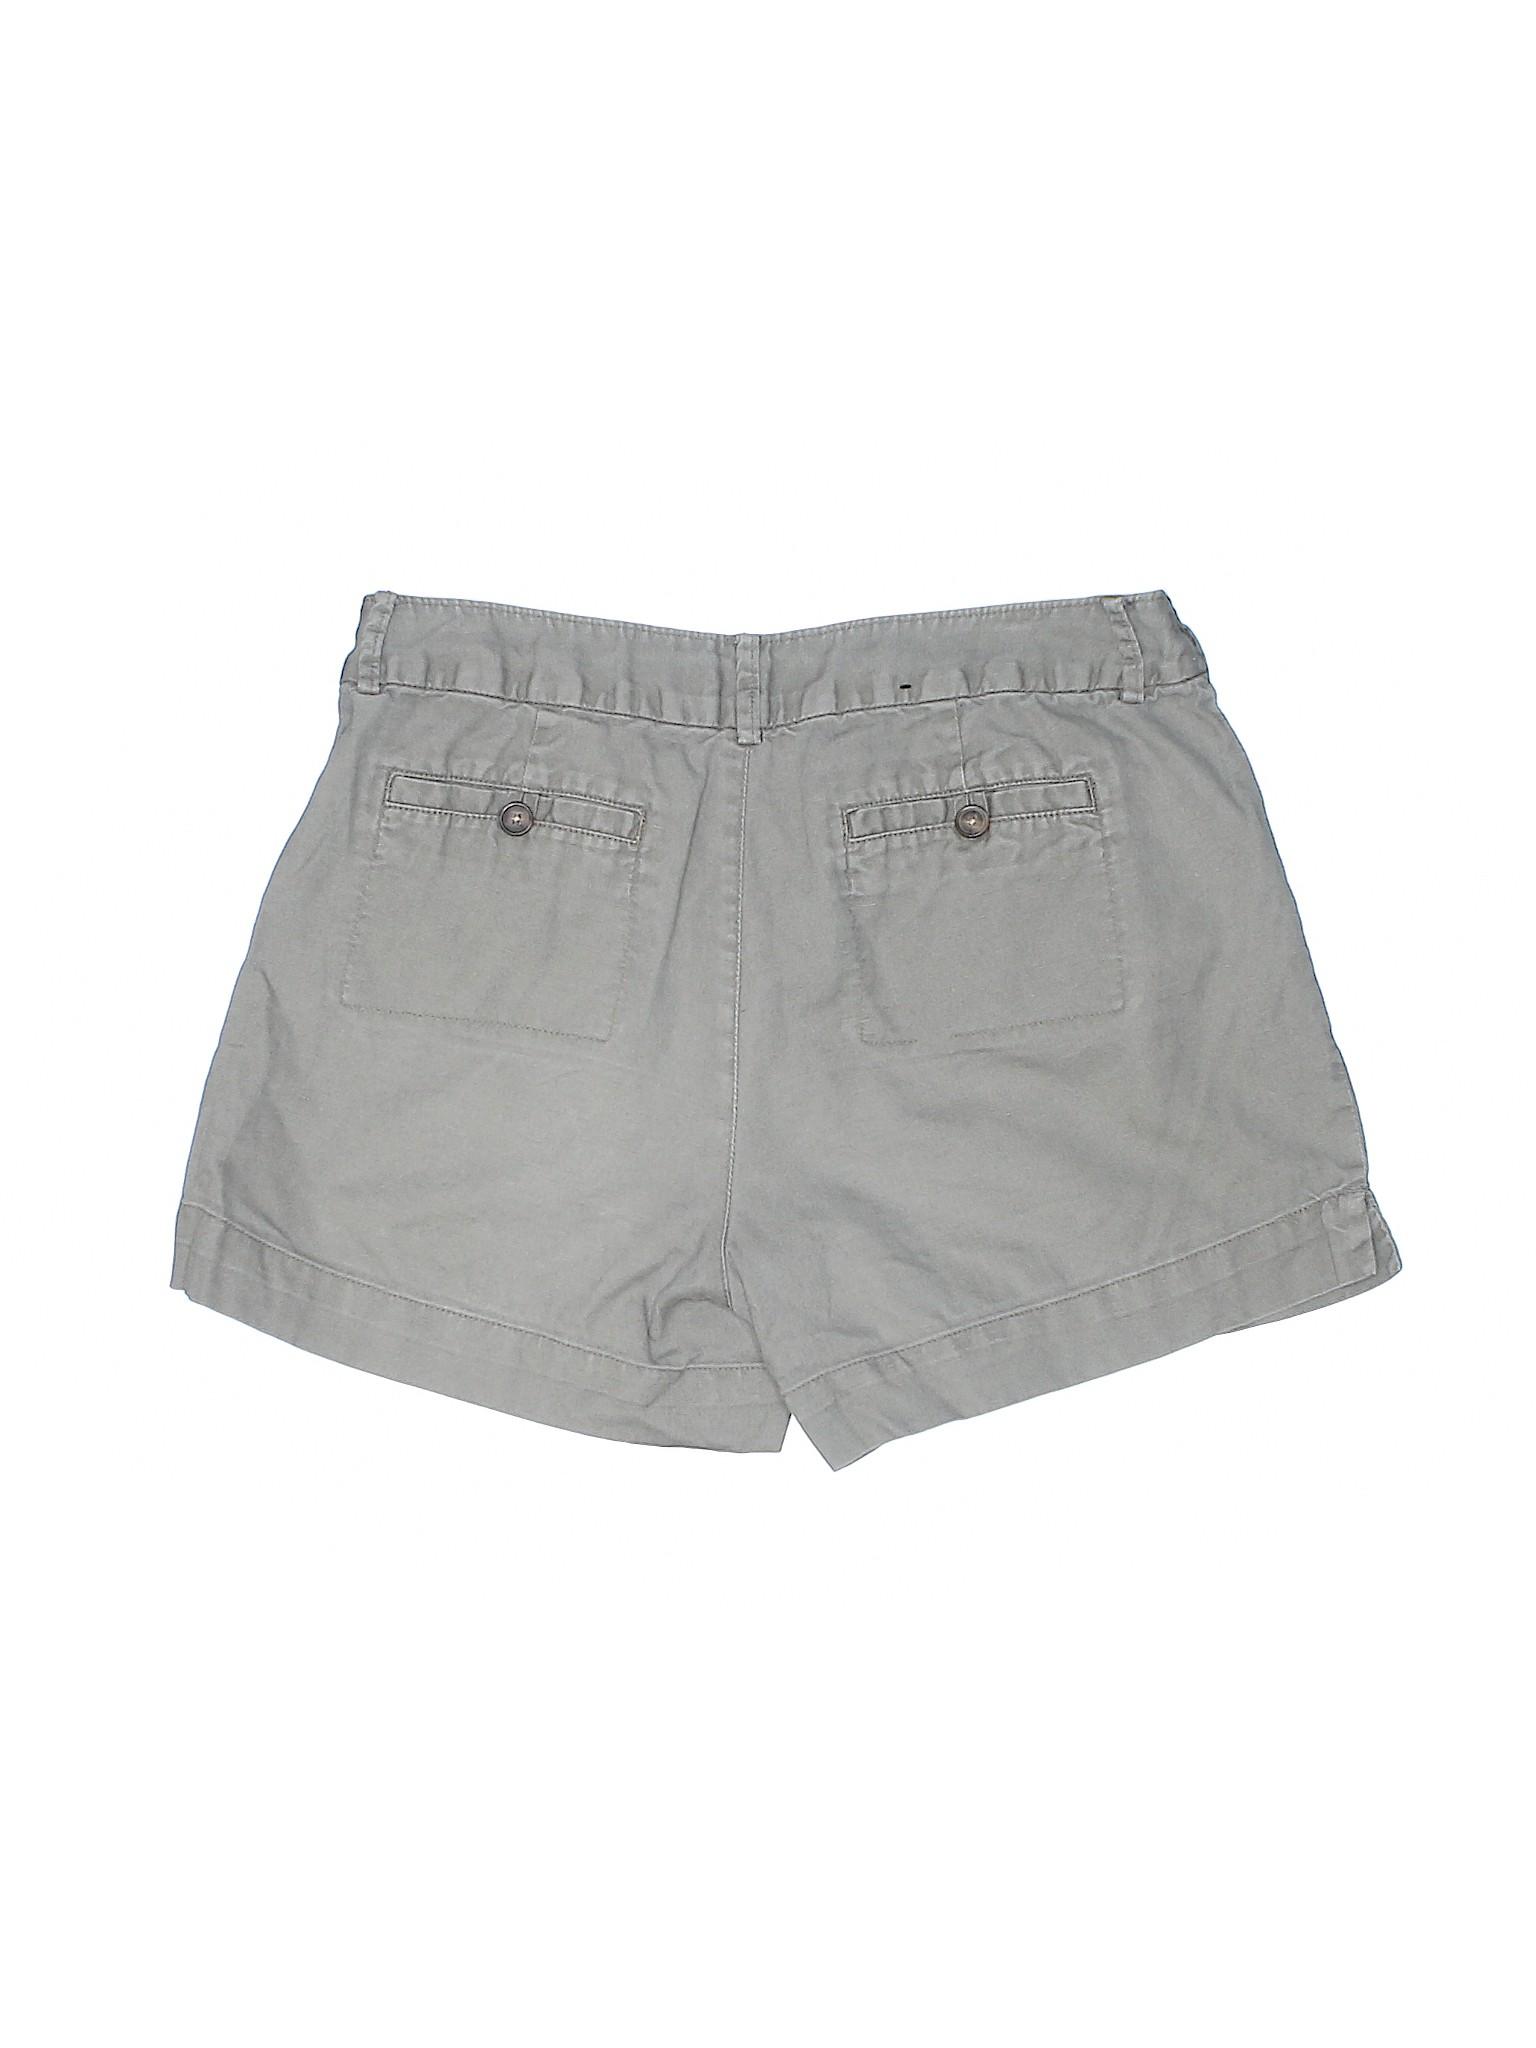 Republic Khaki Banana Leisure Boutique Shorts pEwq5P1